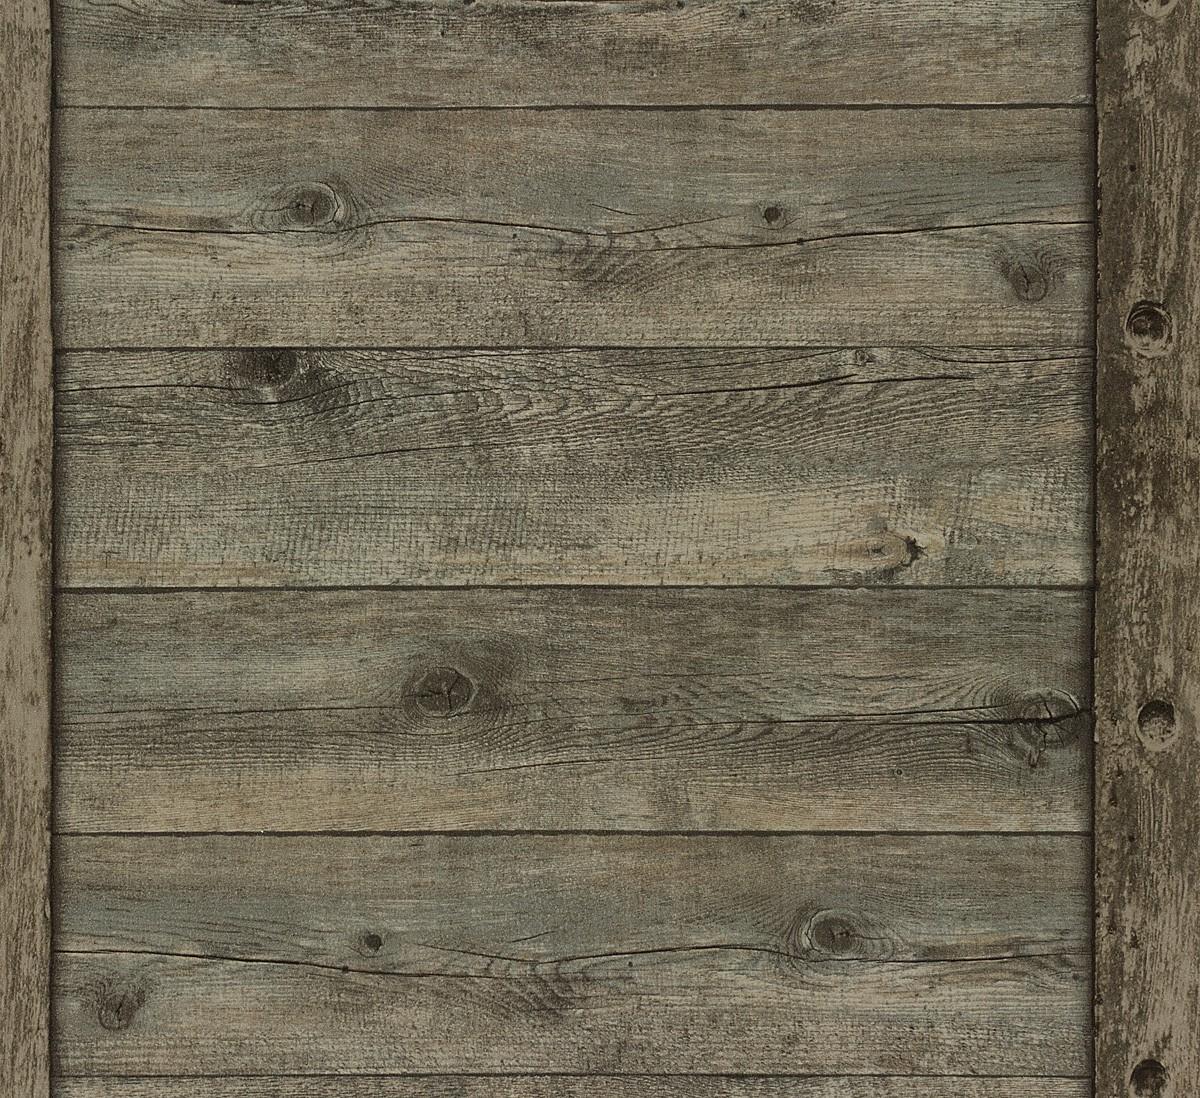 Rasch Tapeten Home Style : zu Vliestapete braun grau Holz Home Style Rasch 861419 (3,18?/1qm